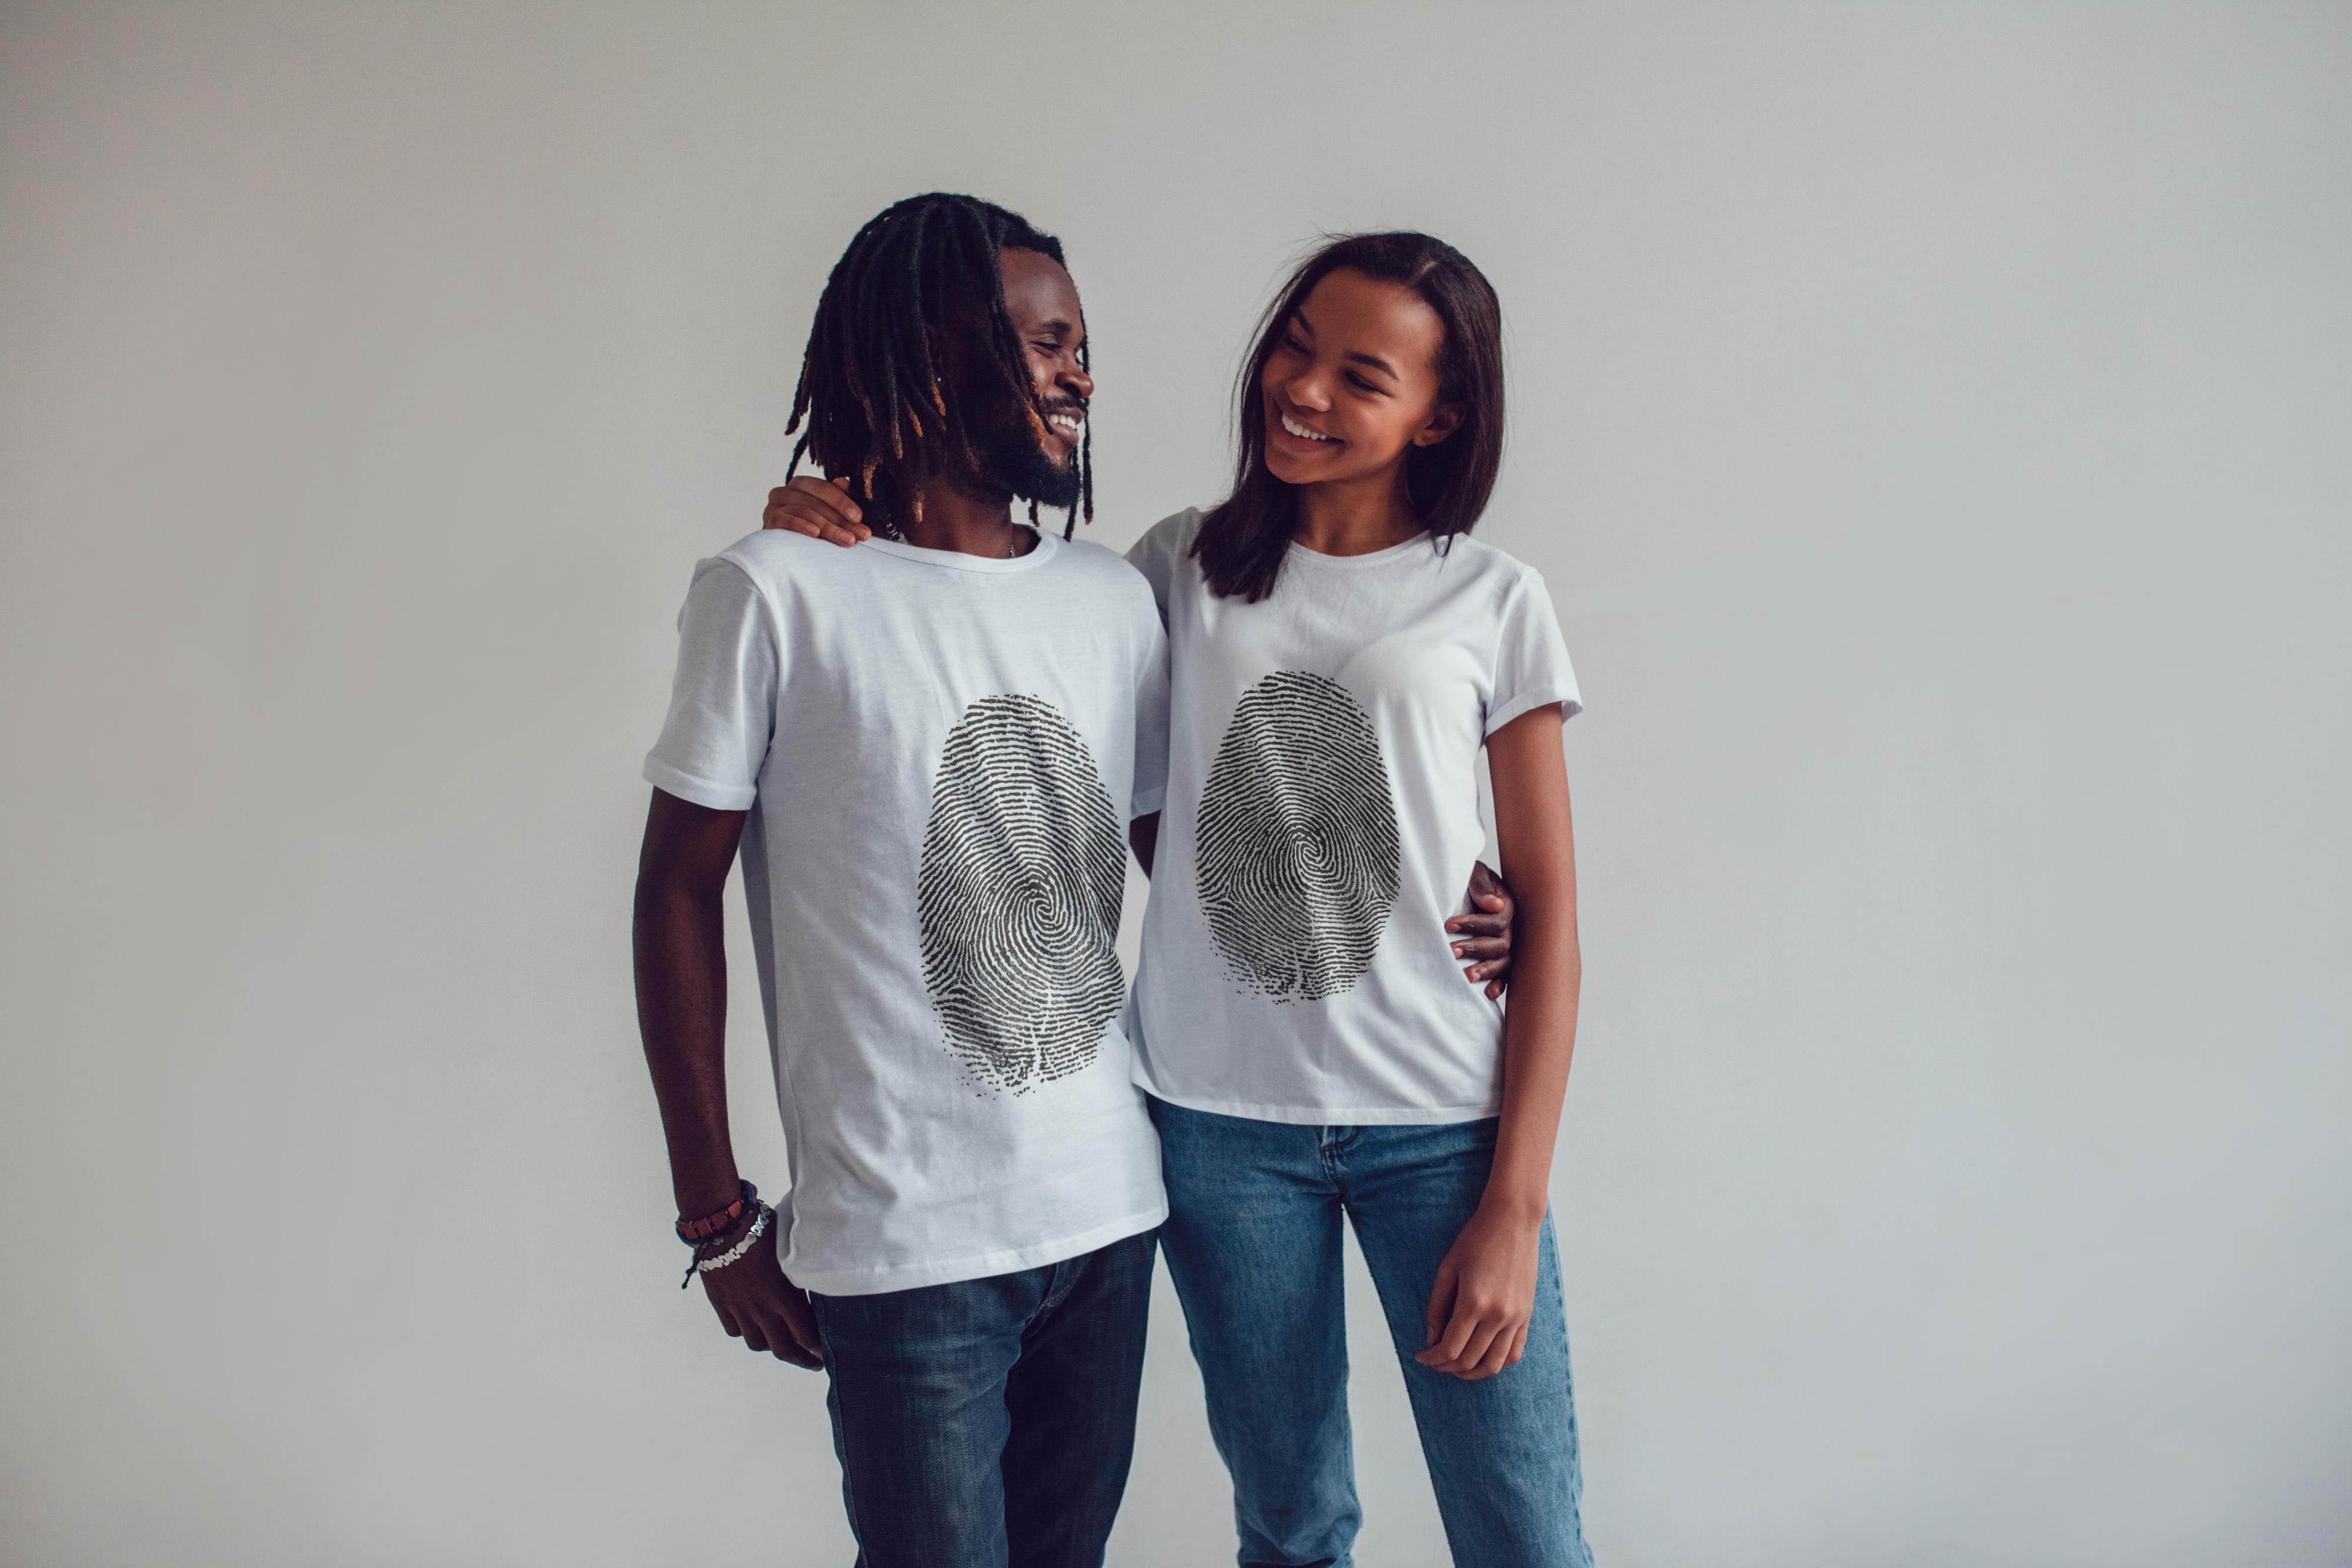 T-Shirt Mock-Up 2018 #1 example image 5